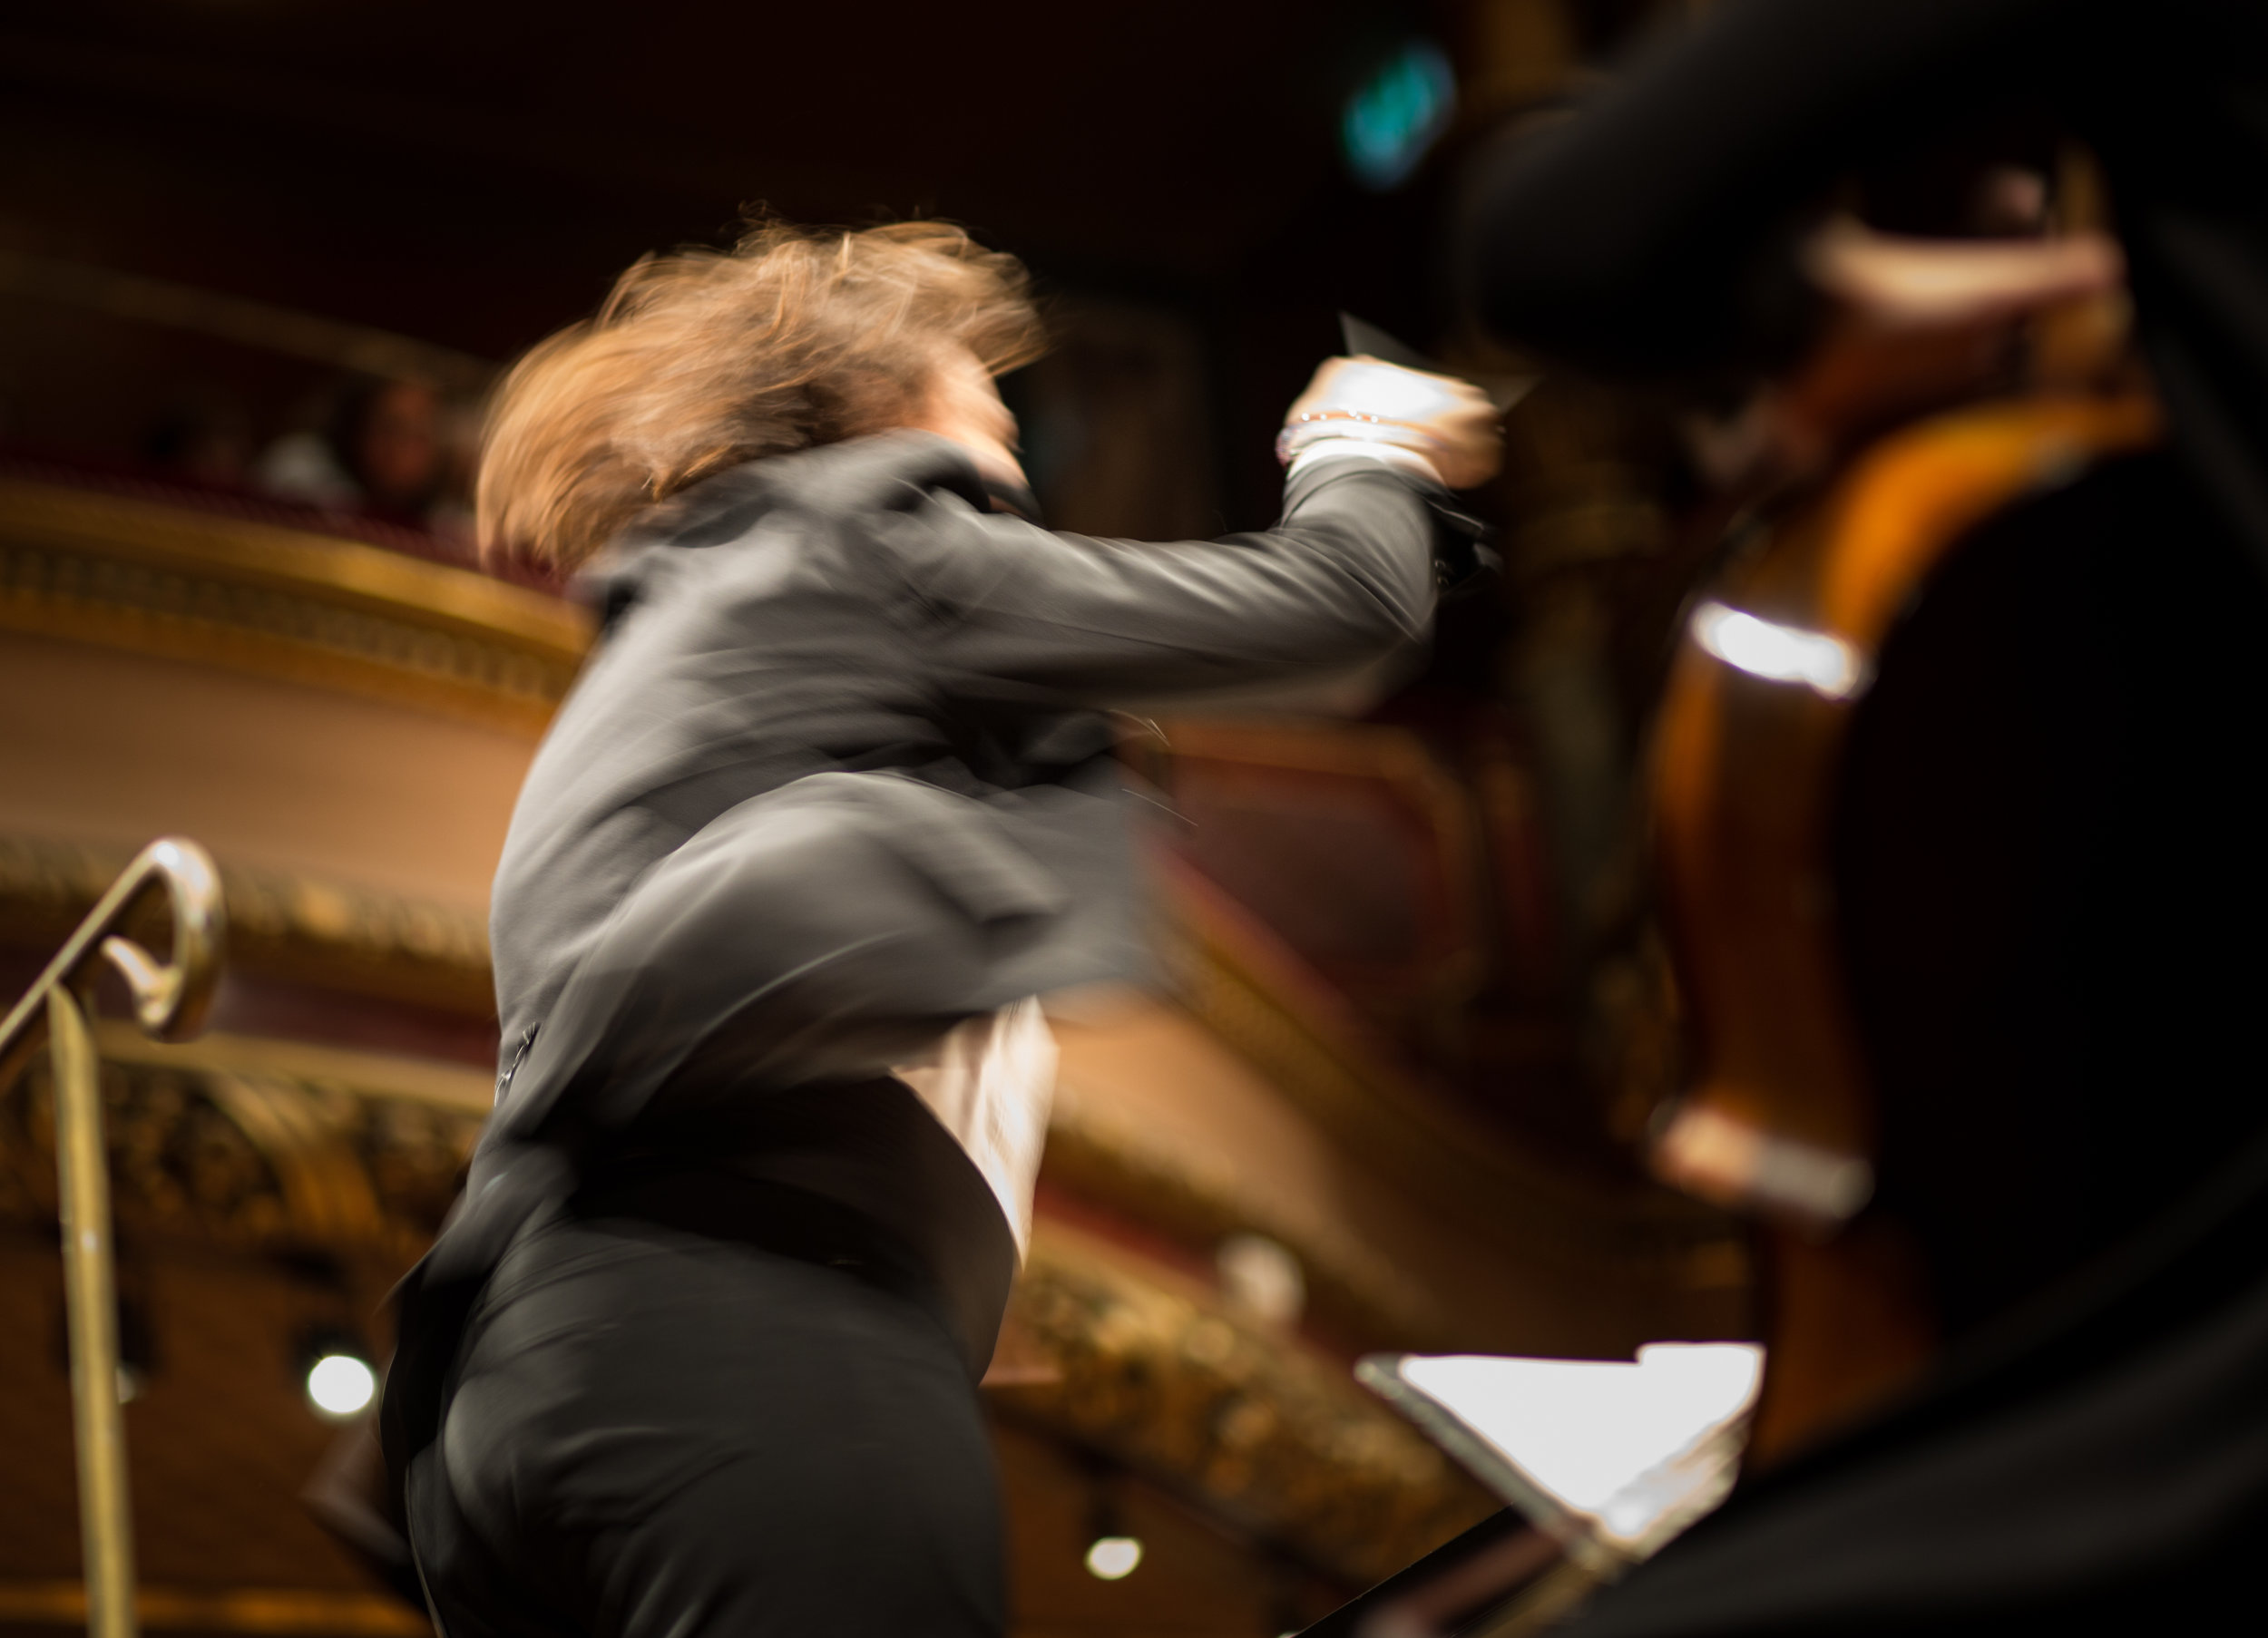 The Conductor_jpg-9218.jpg